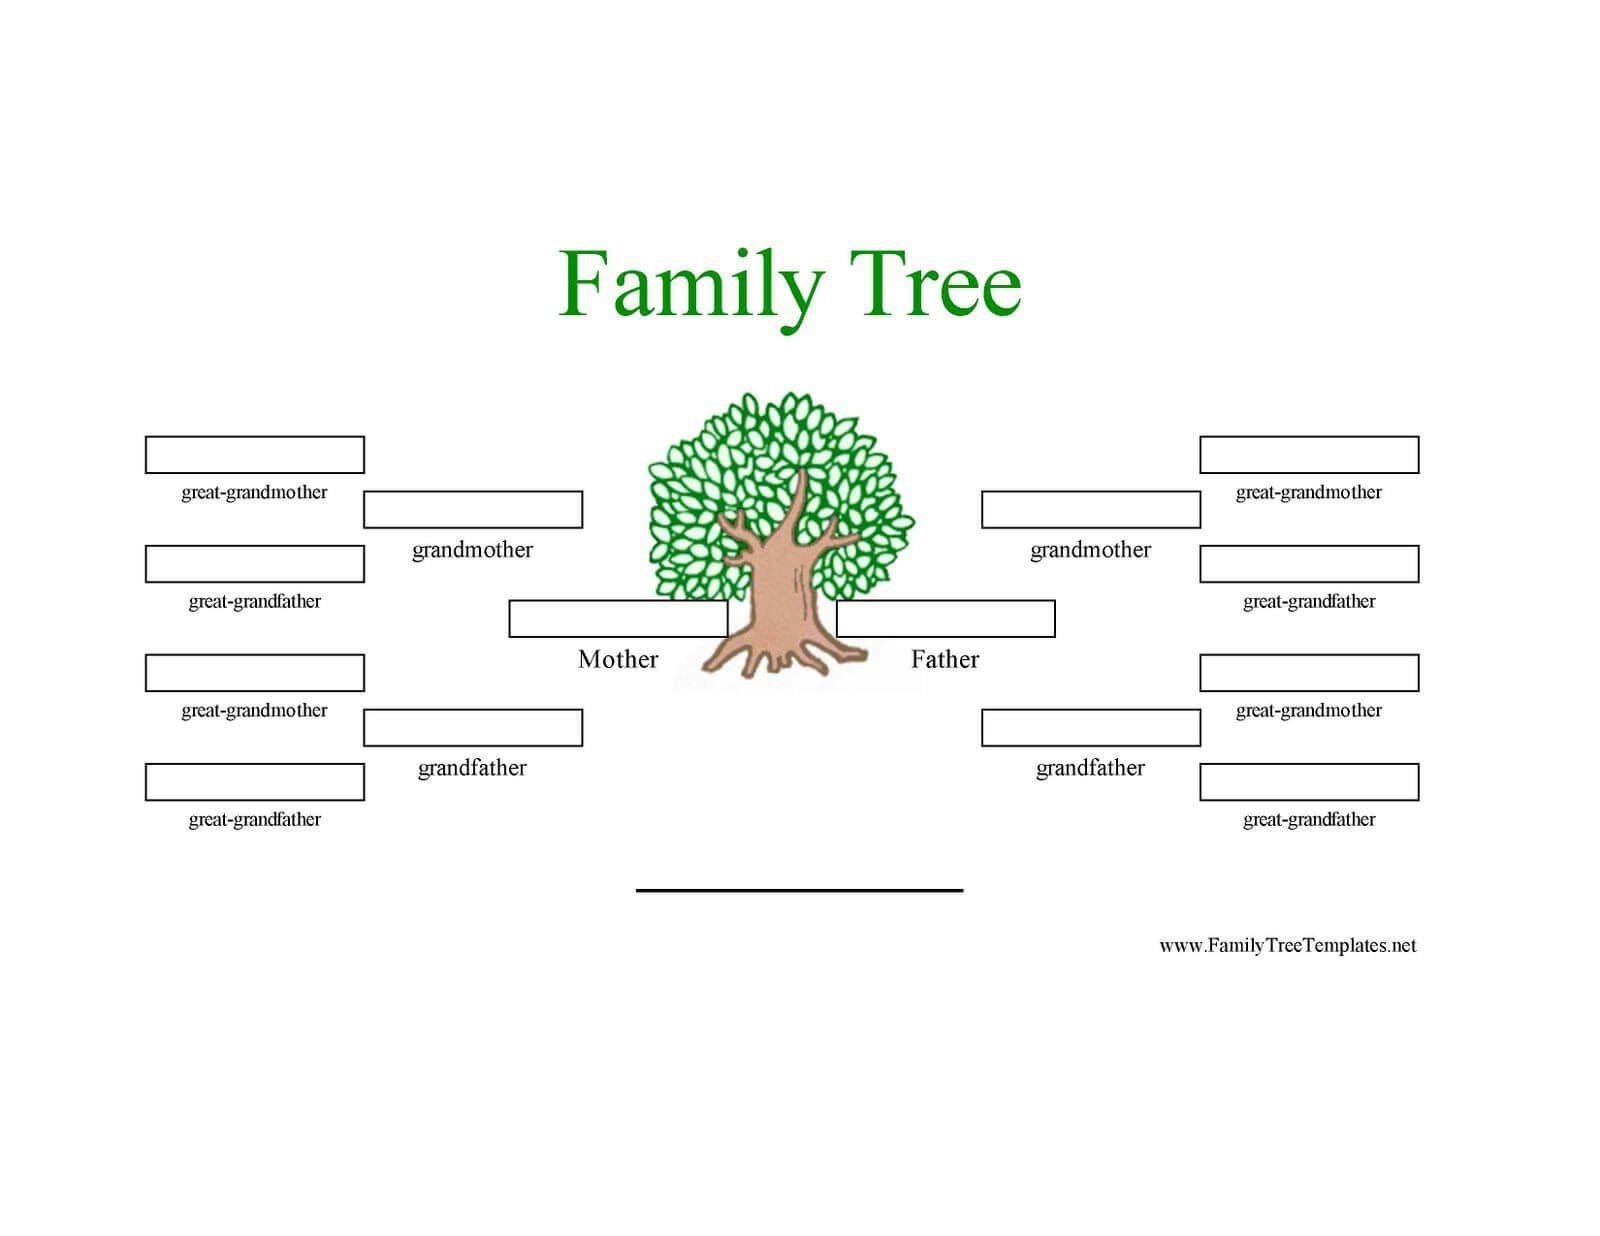 12 Generation Family Tree Sample | Generations Family Tree With Blank Family Tree Template 3 Generations